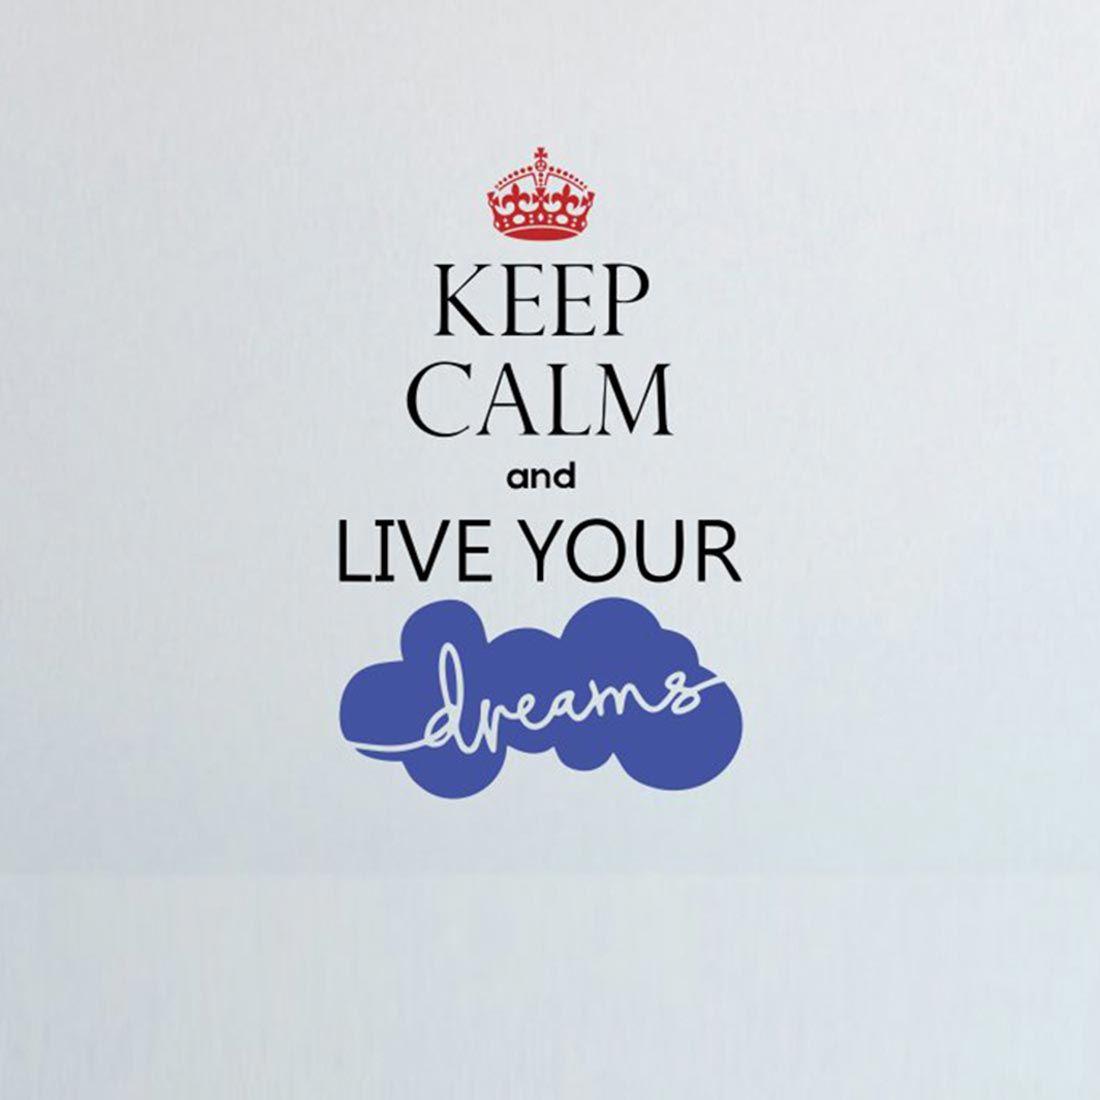 Keep Calm Quotes - Keep Calm Funny Quotes - Keep Calm Memes